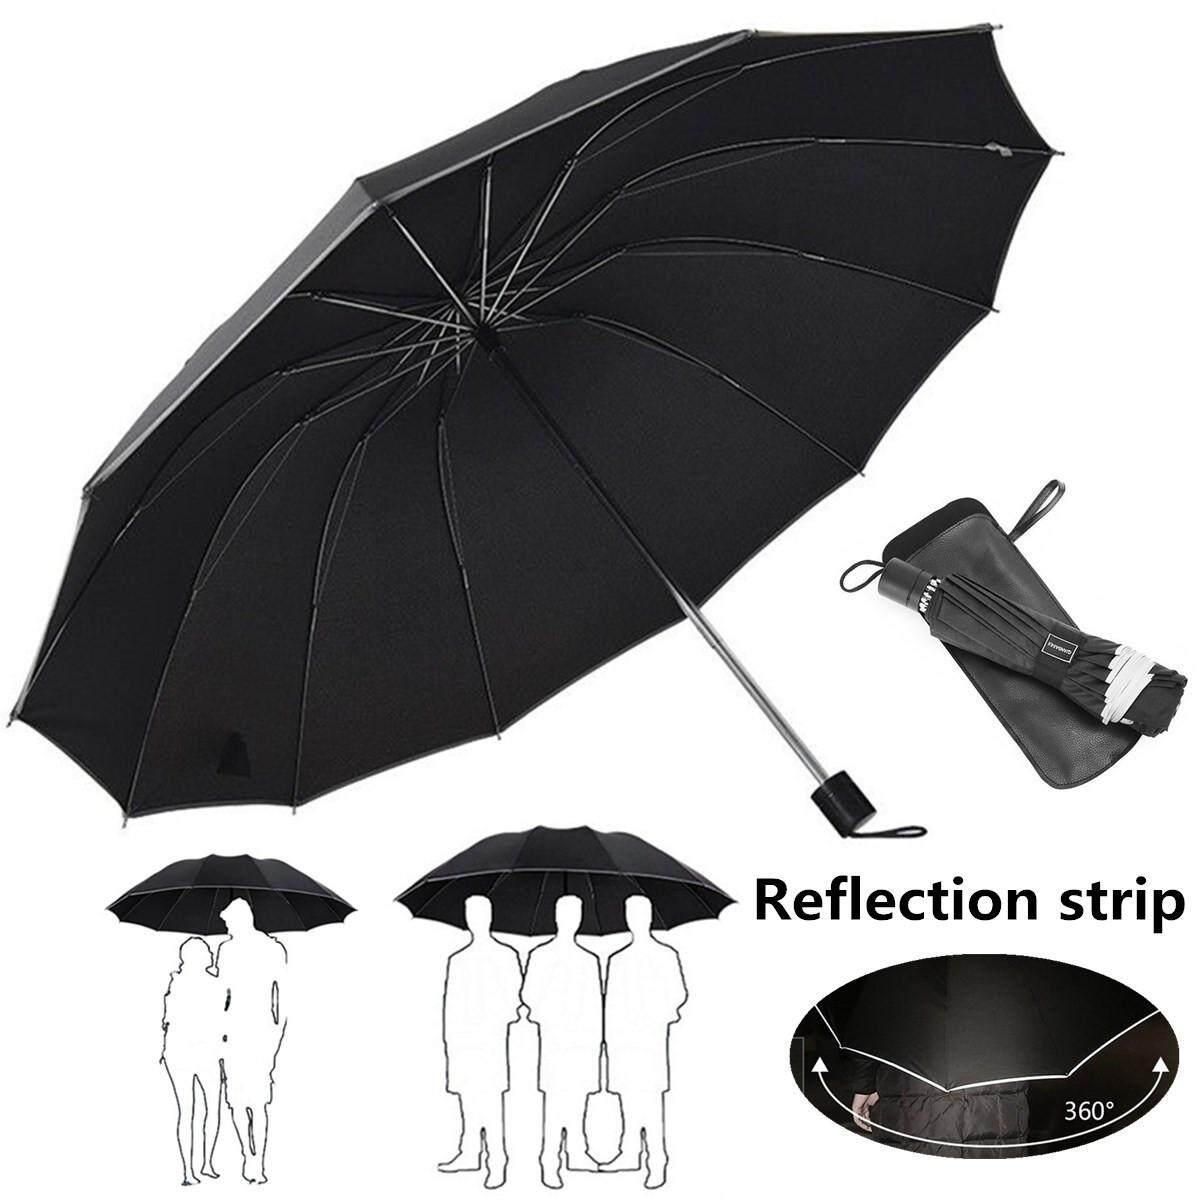 af6ffab3ef29 Latest No Brand Men's Umbrellas Products | Enjoy Huge Discounts ...